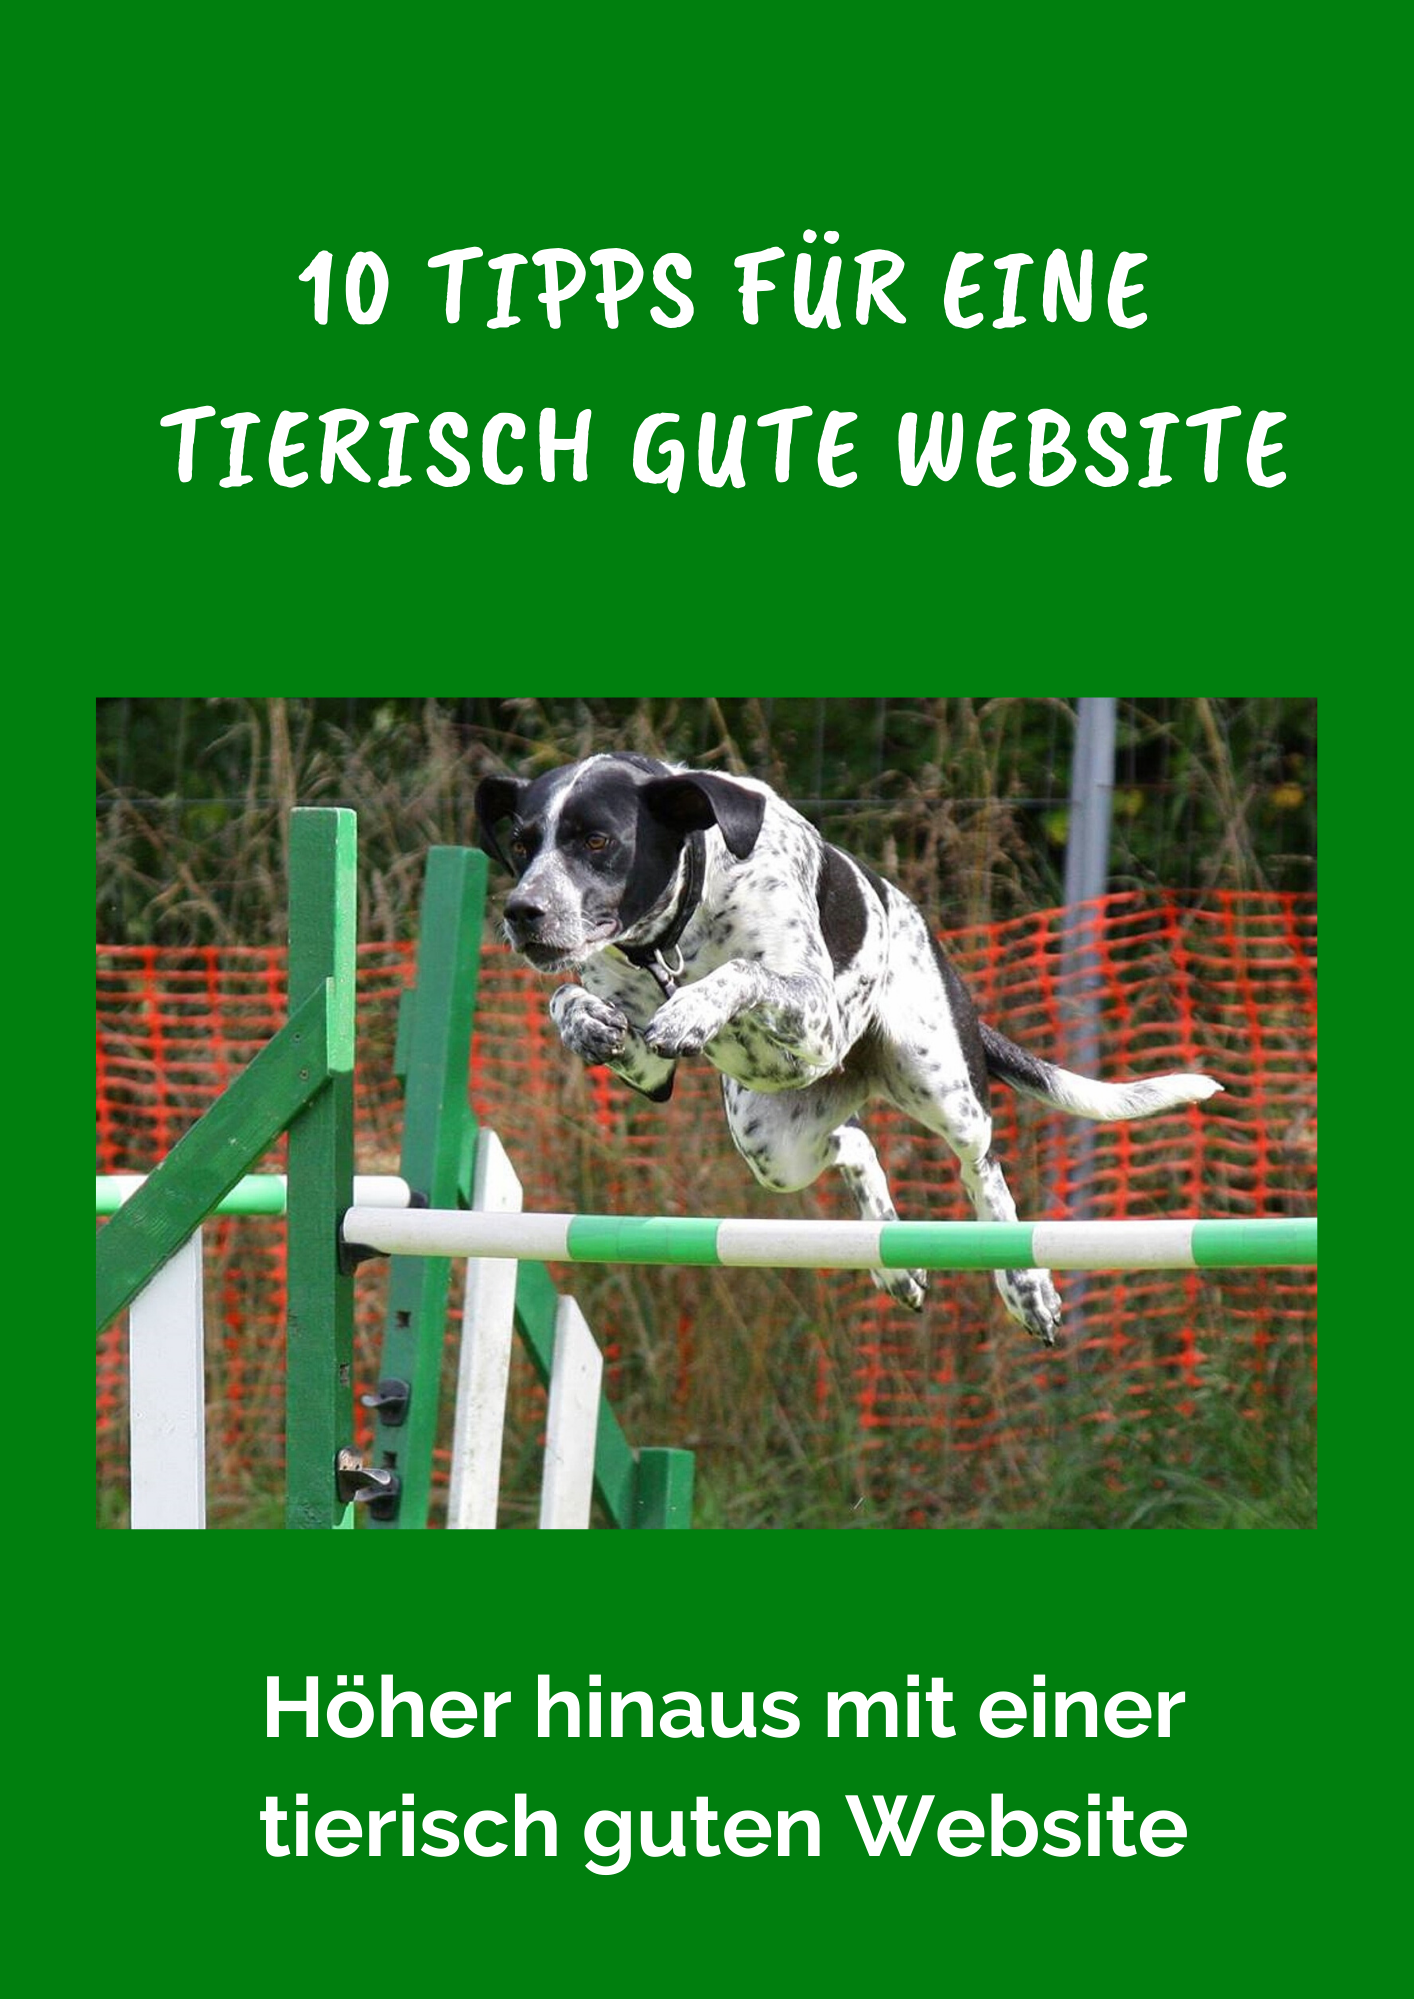 Website Tipps